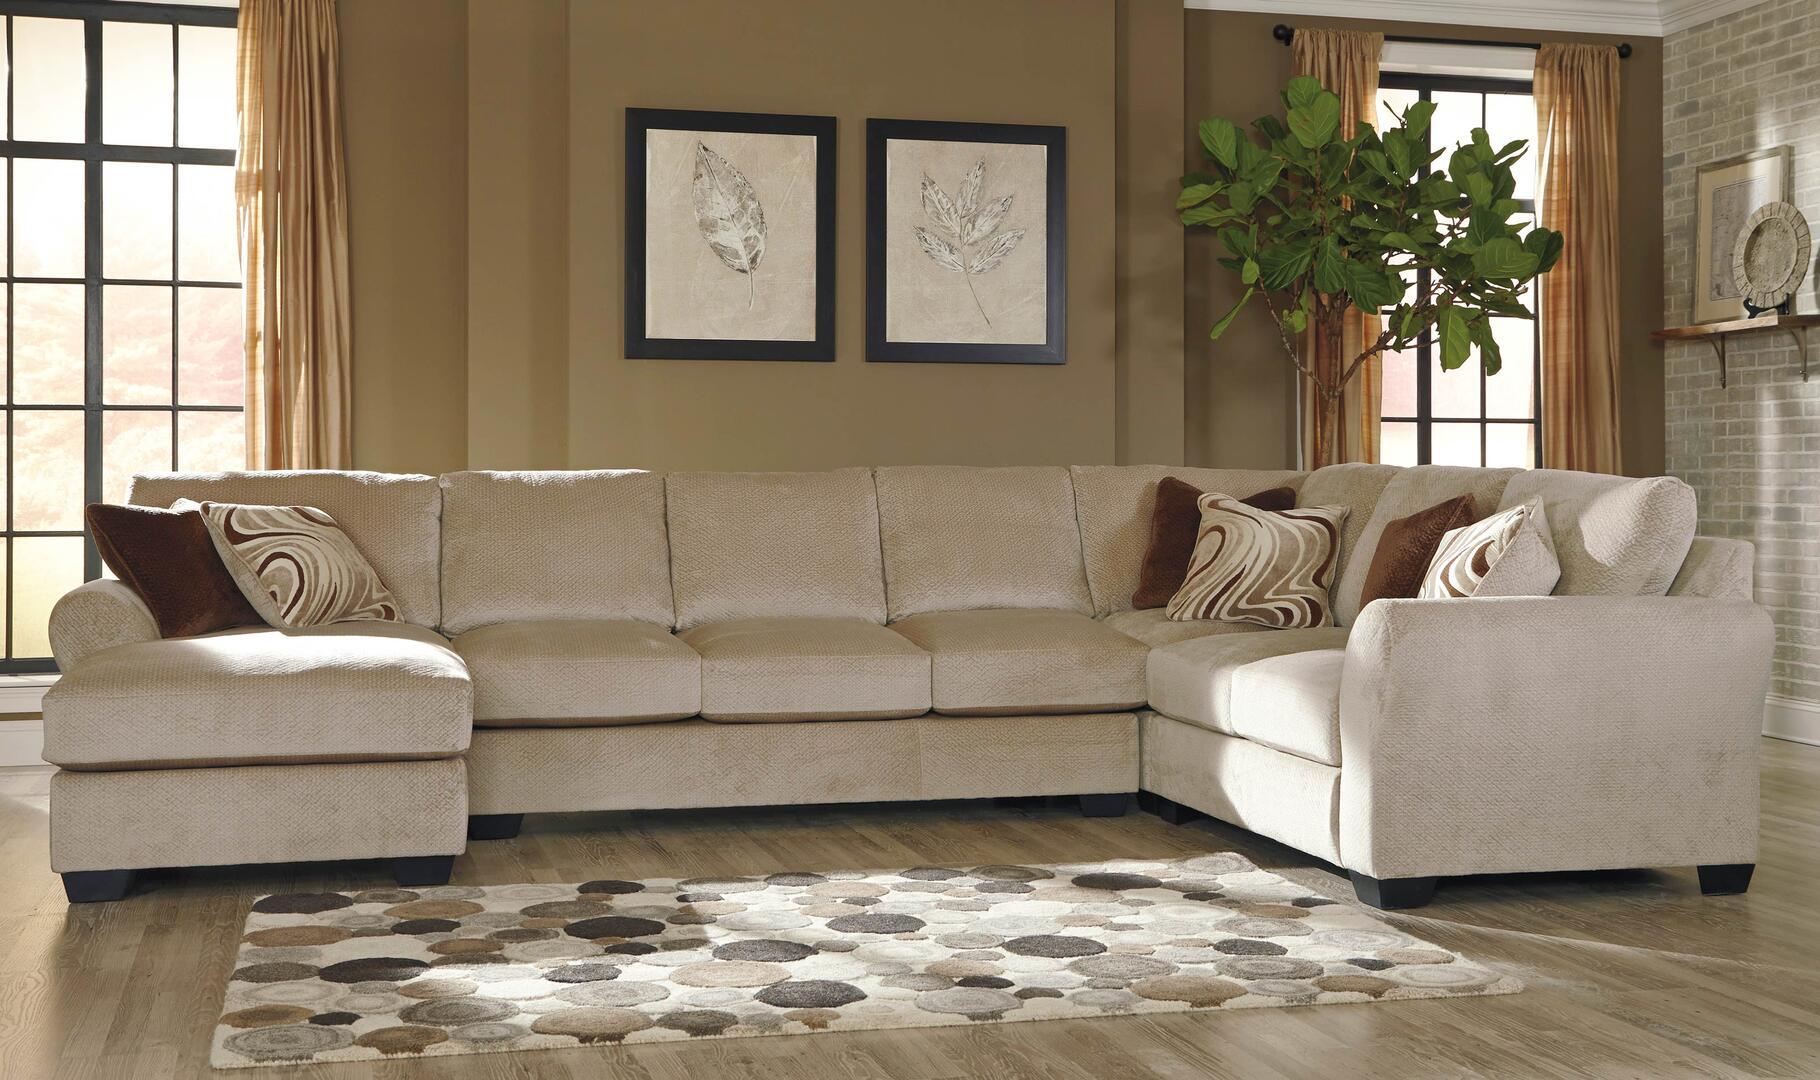 Benchcraft Hazes Series Stationary Fabric Sofa